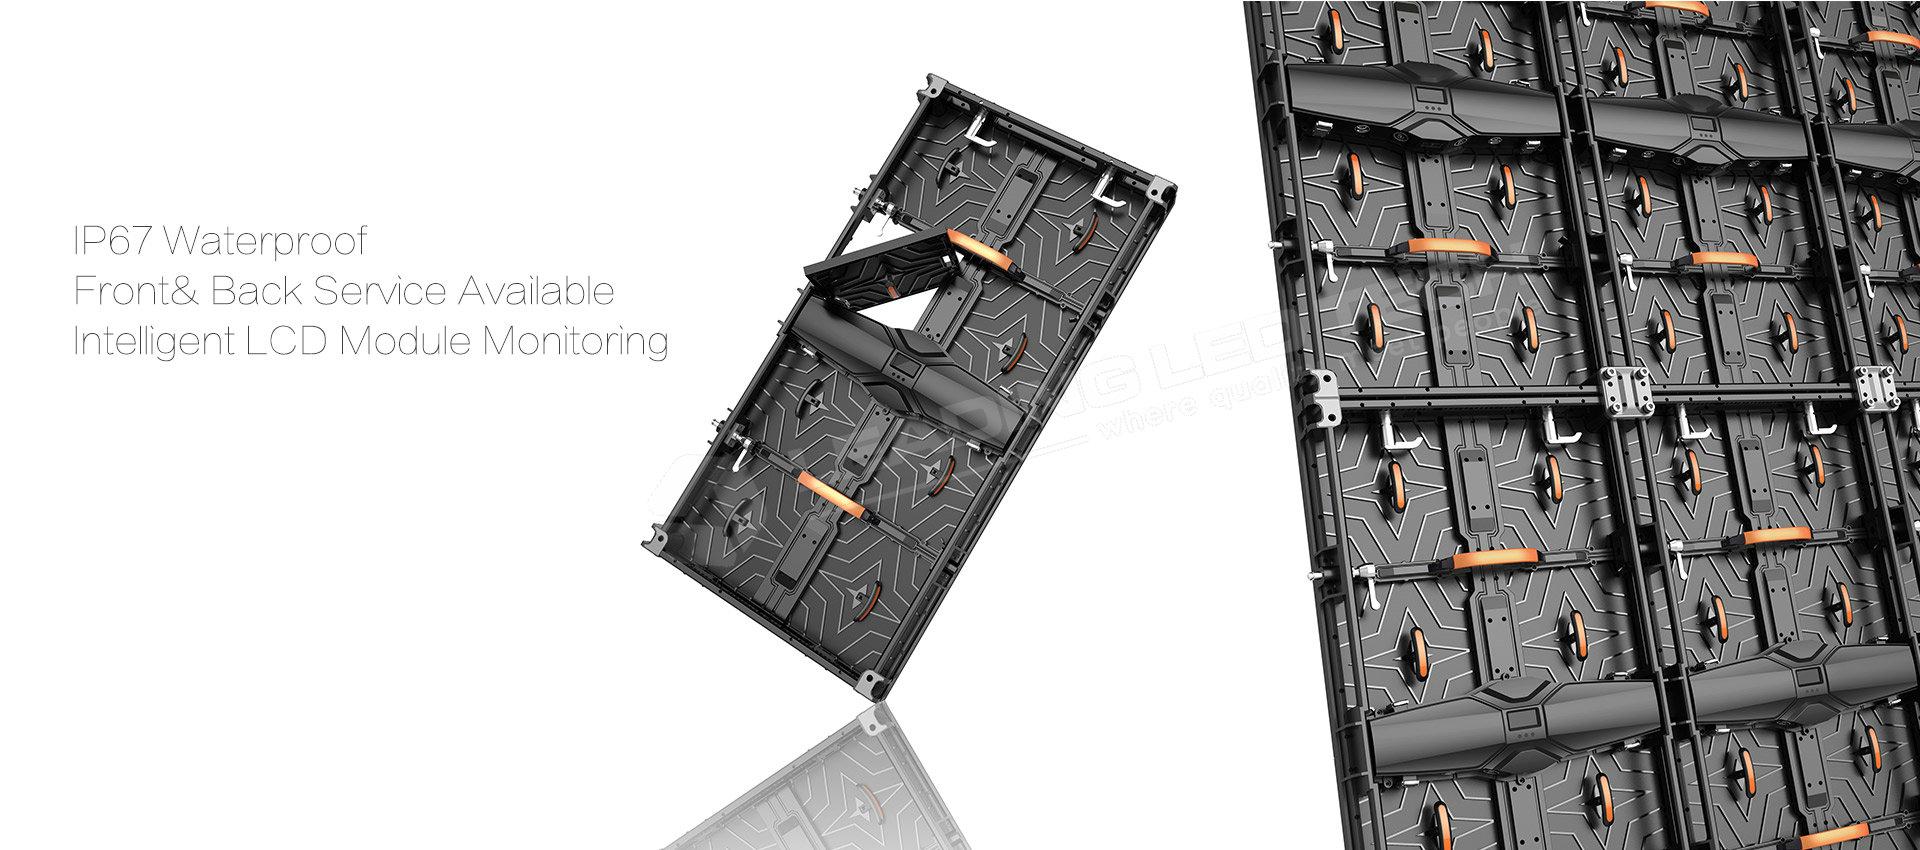 LT-RIS Series 500X1000 LED rental cabinets